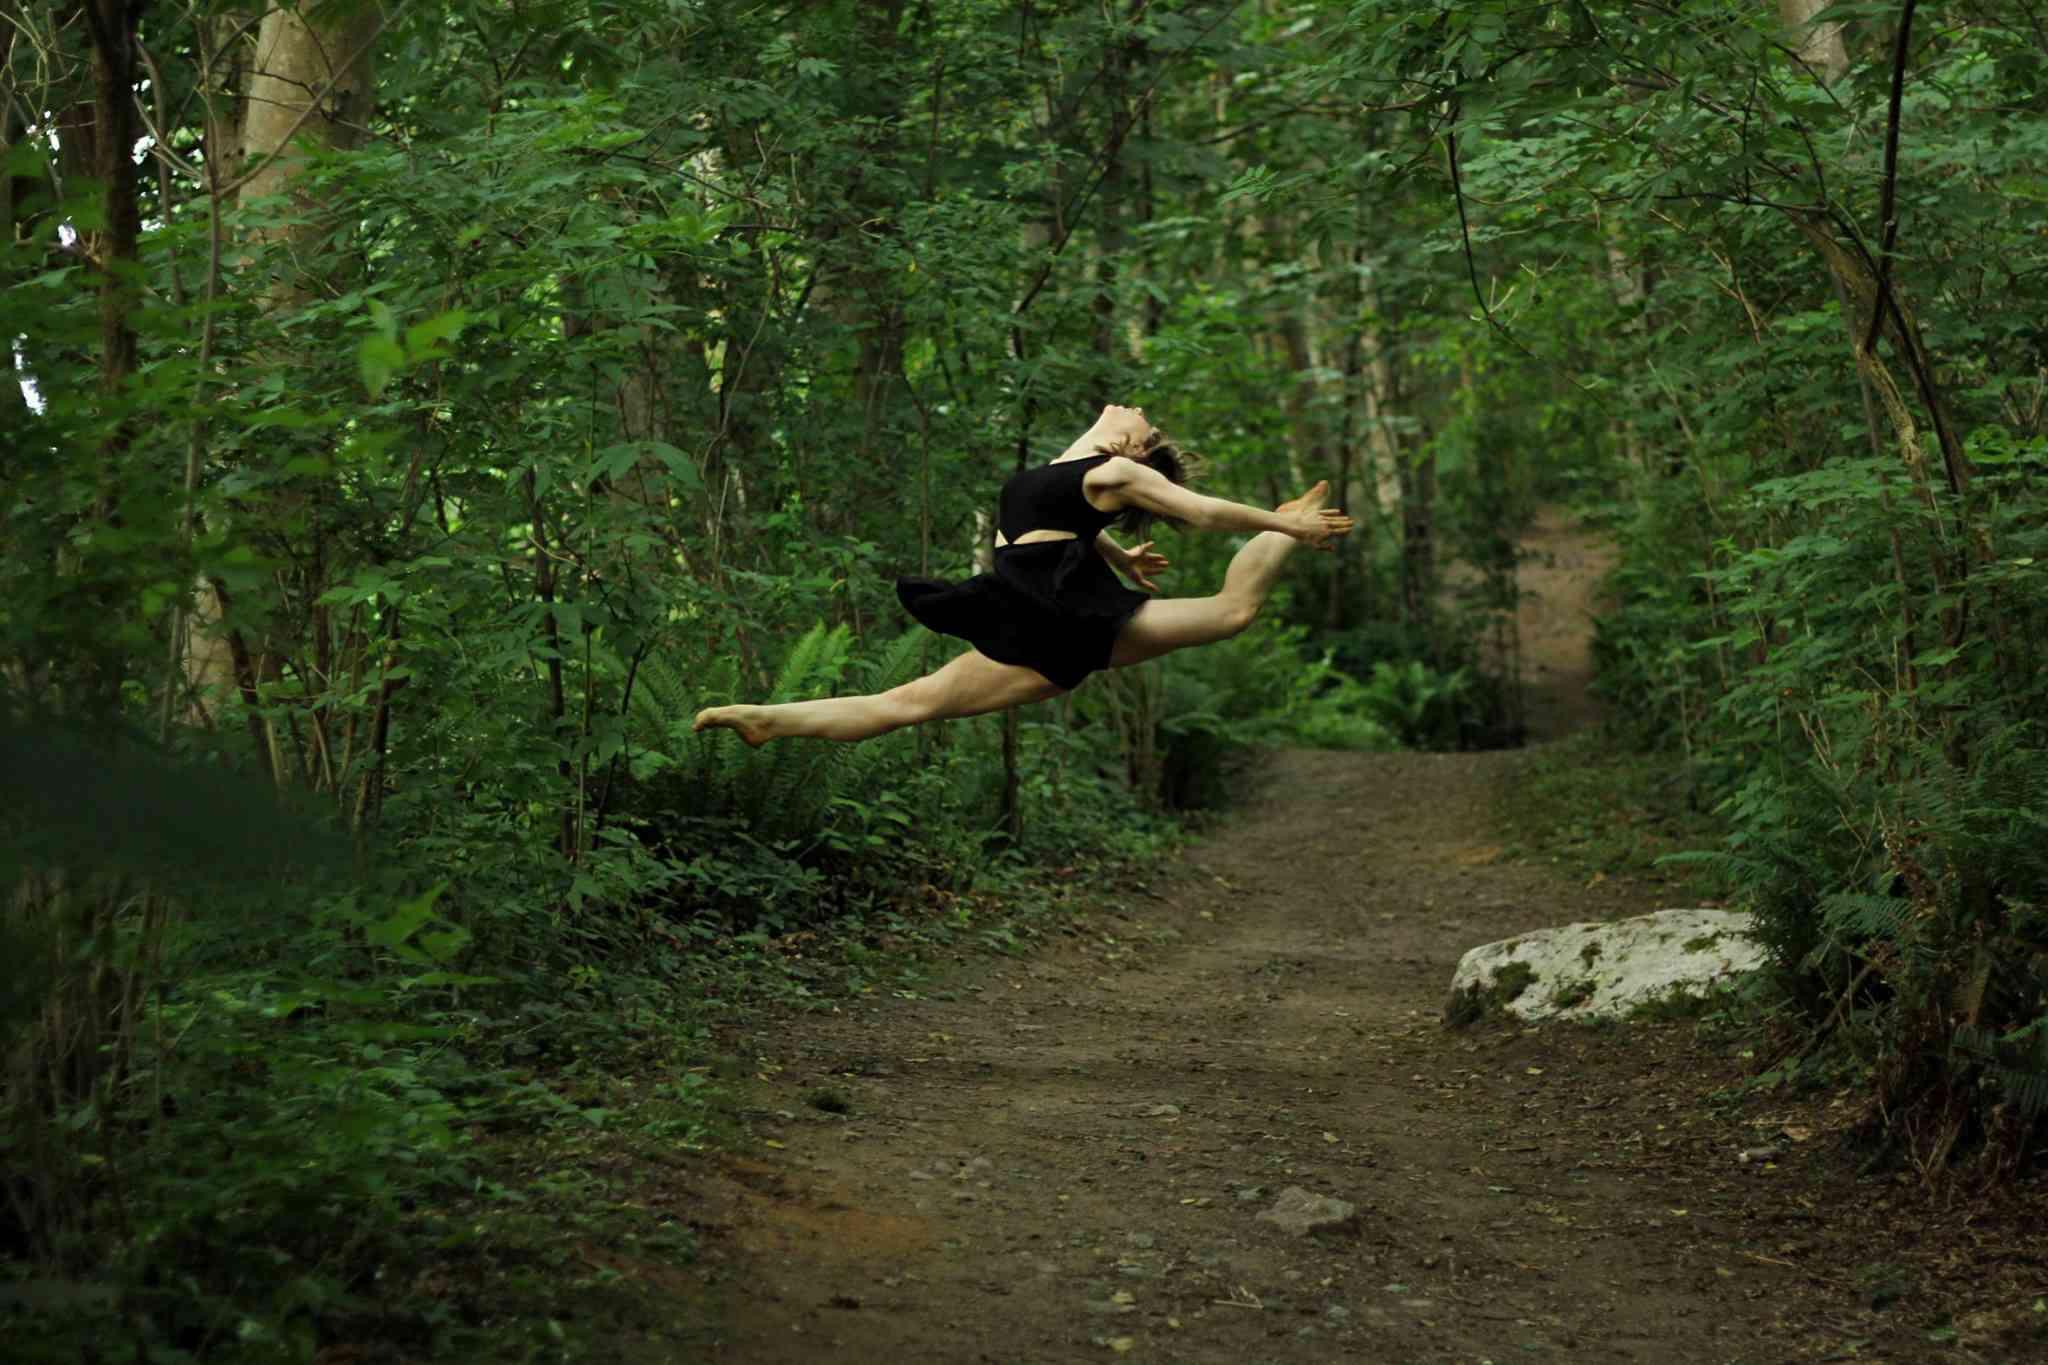 Catalyst Dance photo of Melissa Panetta by Brenda Kent © Dezza Dance 2015